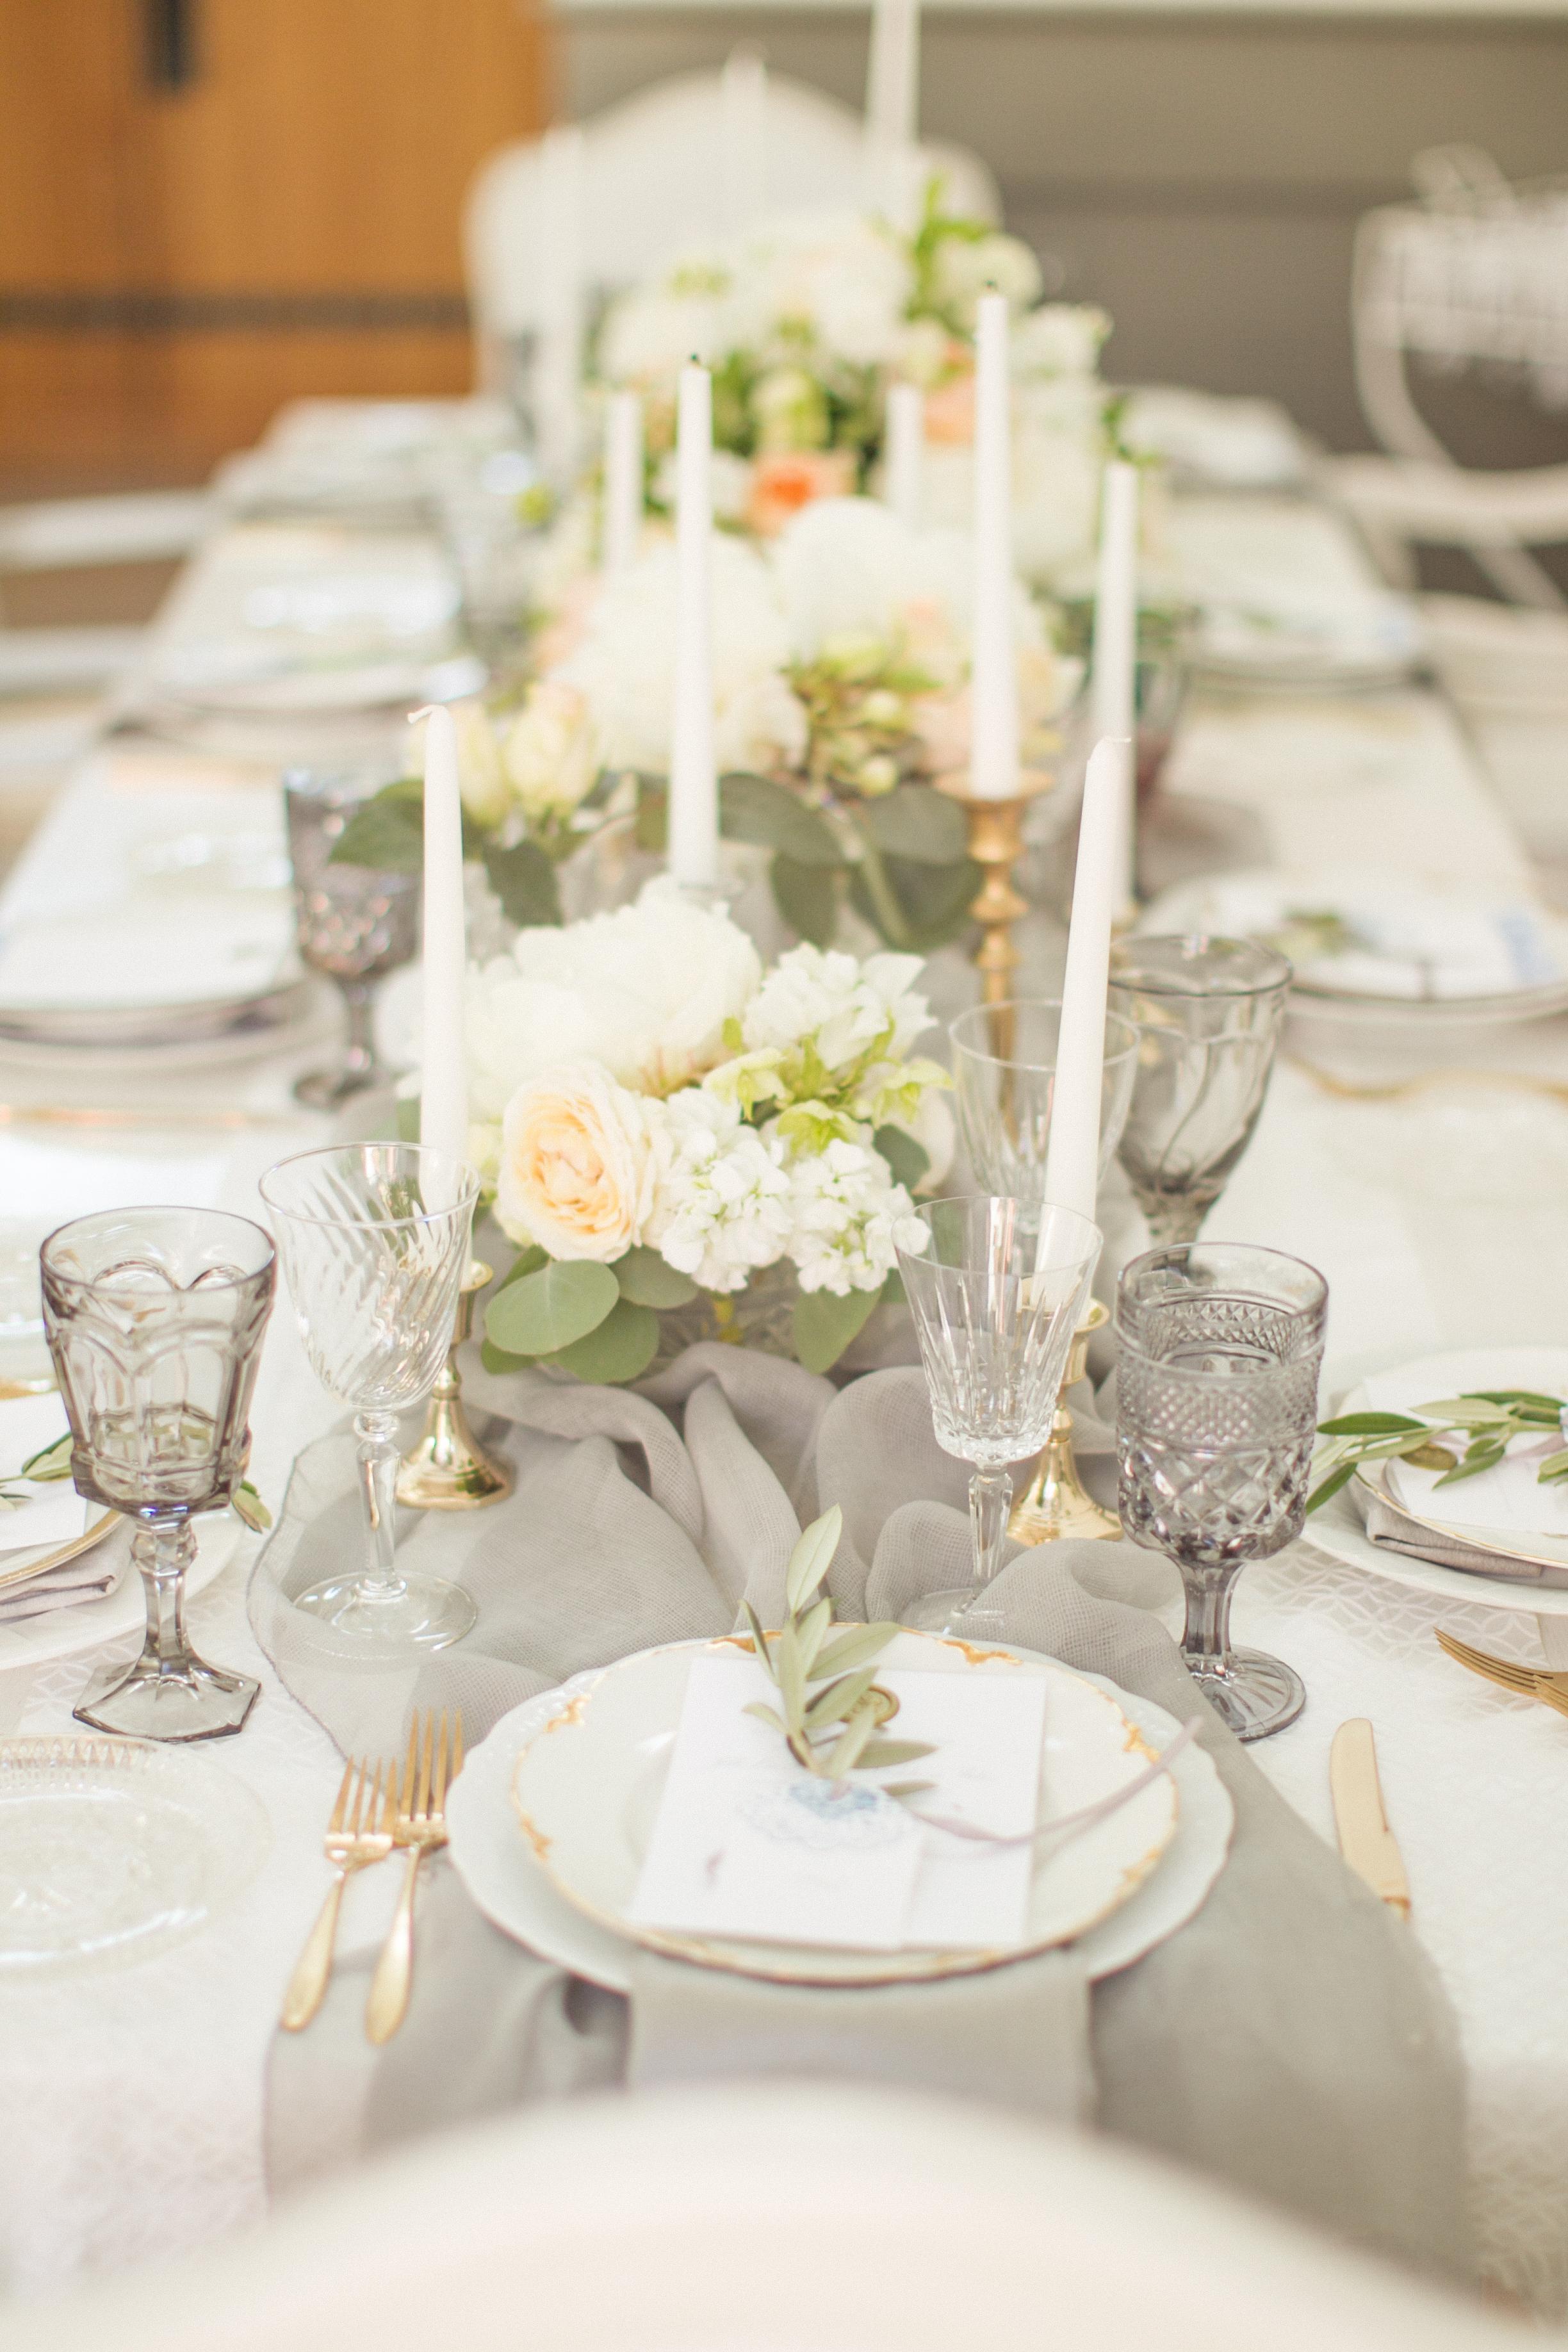 www.santabarbarawedding.com | Atelier de La Fleur Weddings & Events | Mike Larson | Reception Table Details